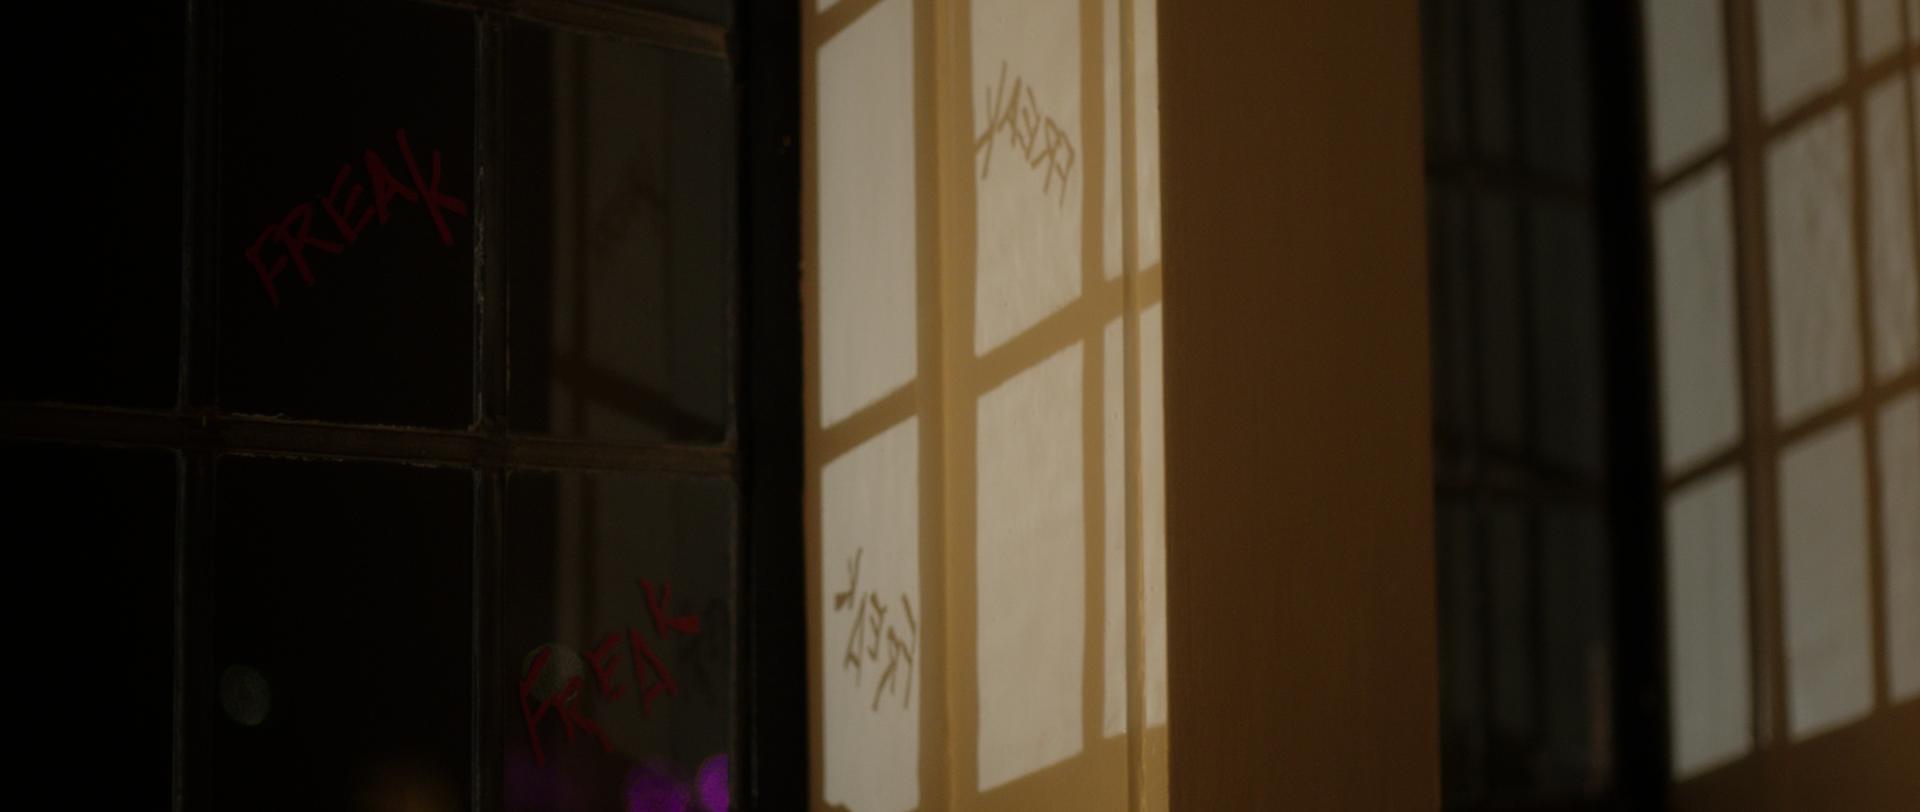 27_Freak Window_CROP.png